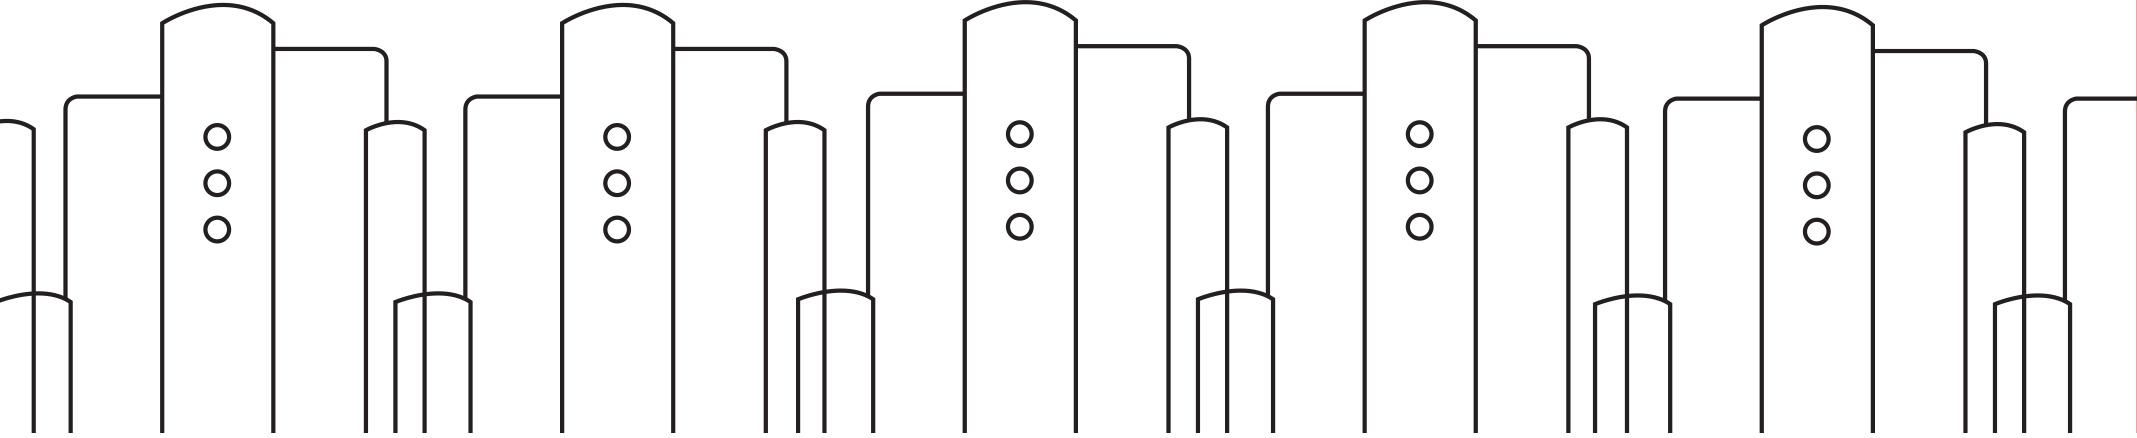 pipes linework.jpg